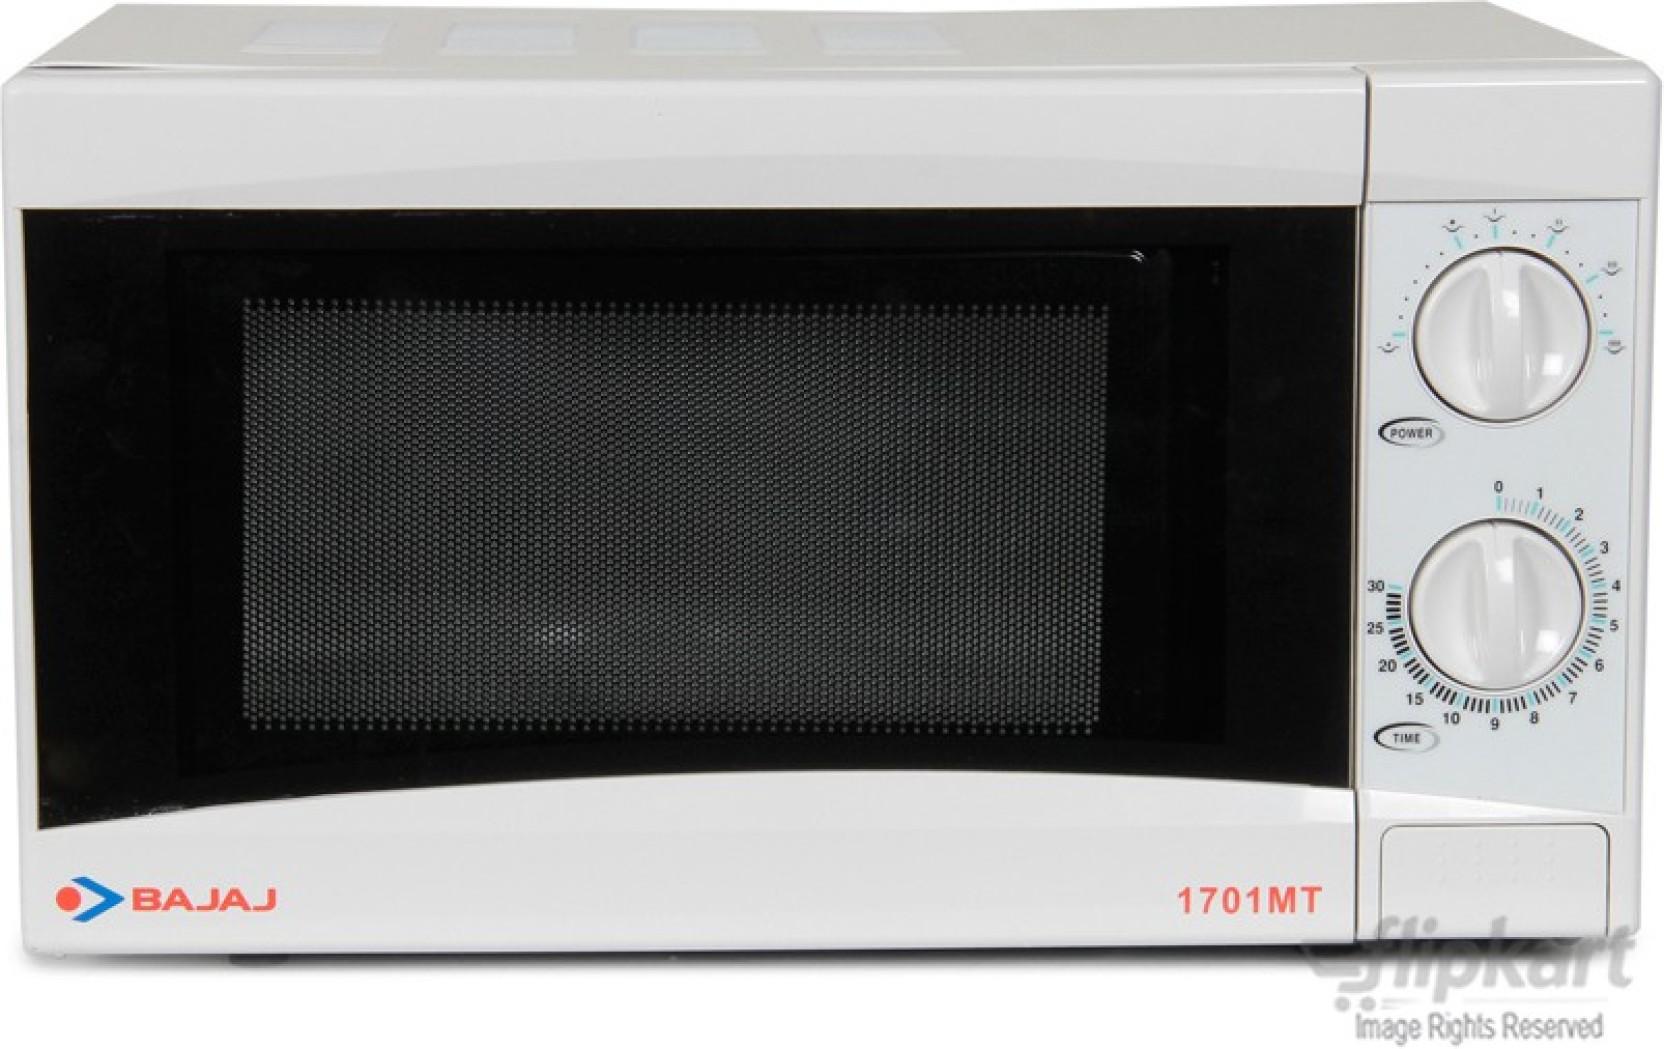 bajaj 17 l solo microwave oven solo. Black Bedroom Furniture Sets. Home Design Ideas